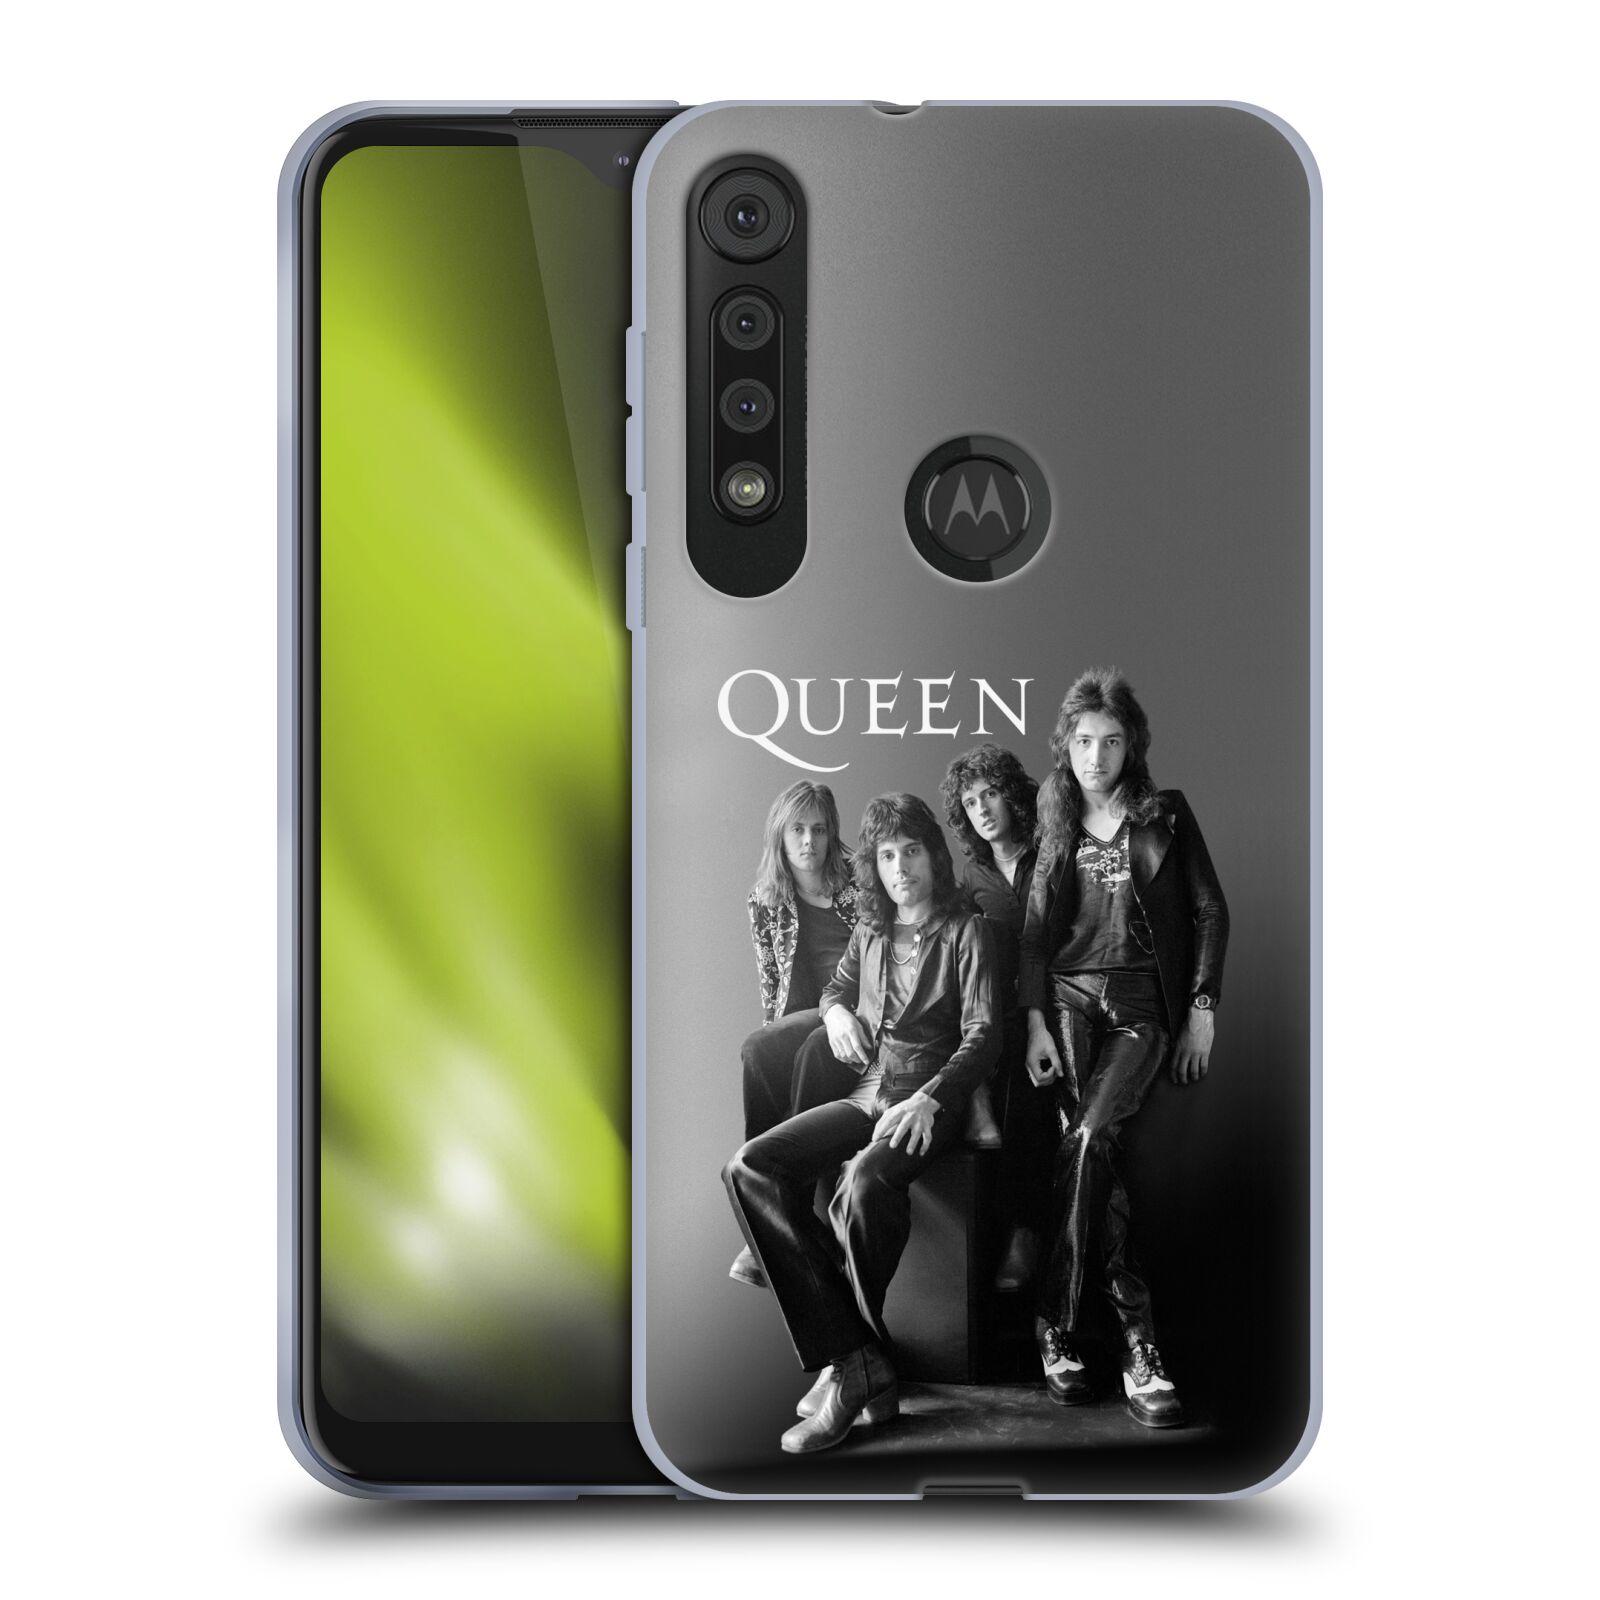 Silikonové pouzdro na mobil Motorola One Macro - Head Case - Queen - Skupina